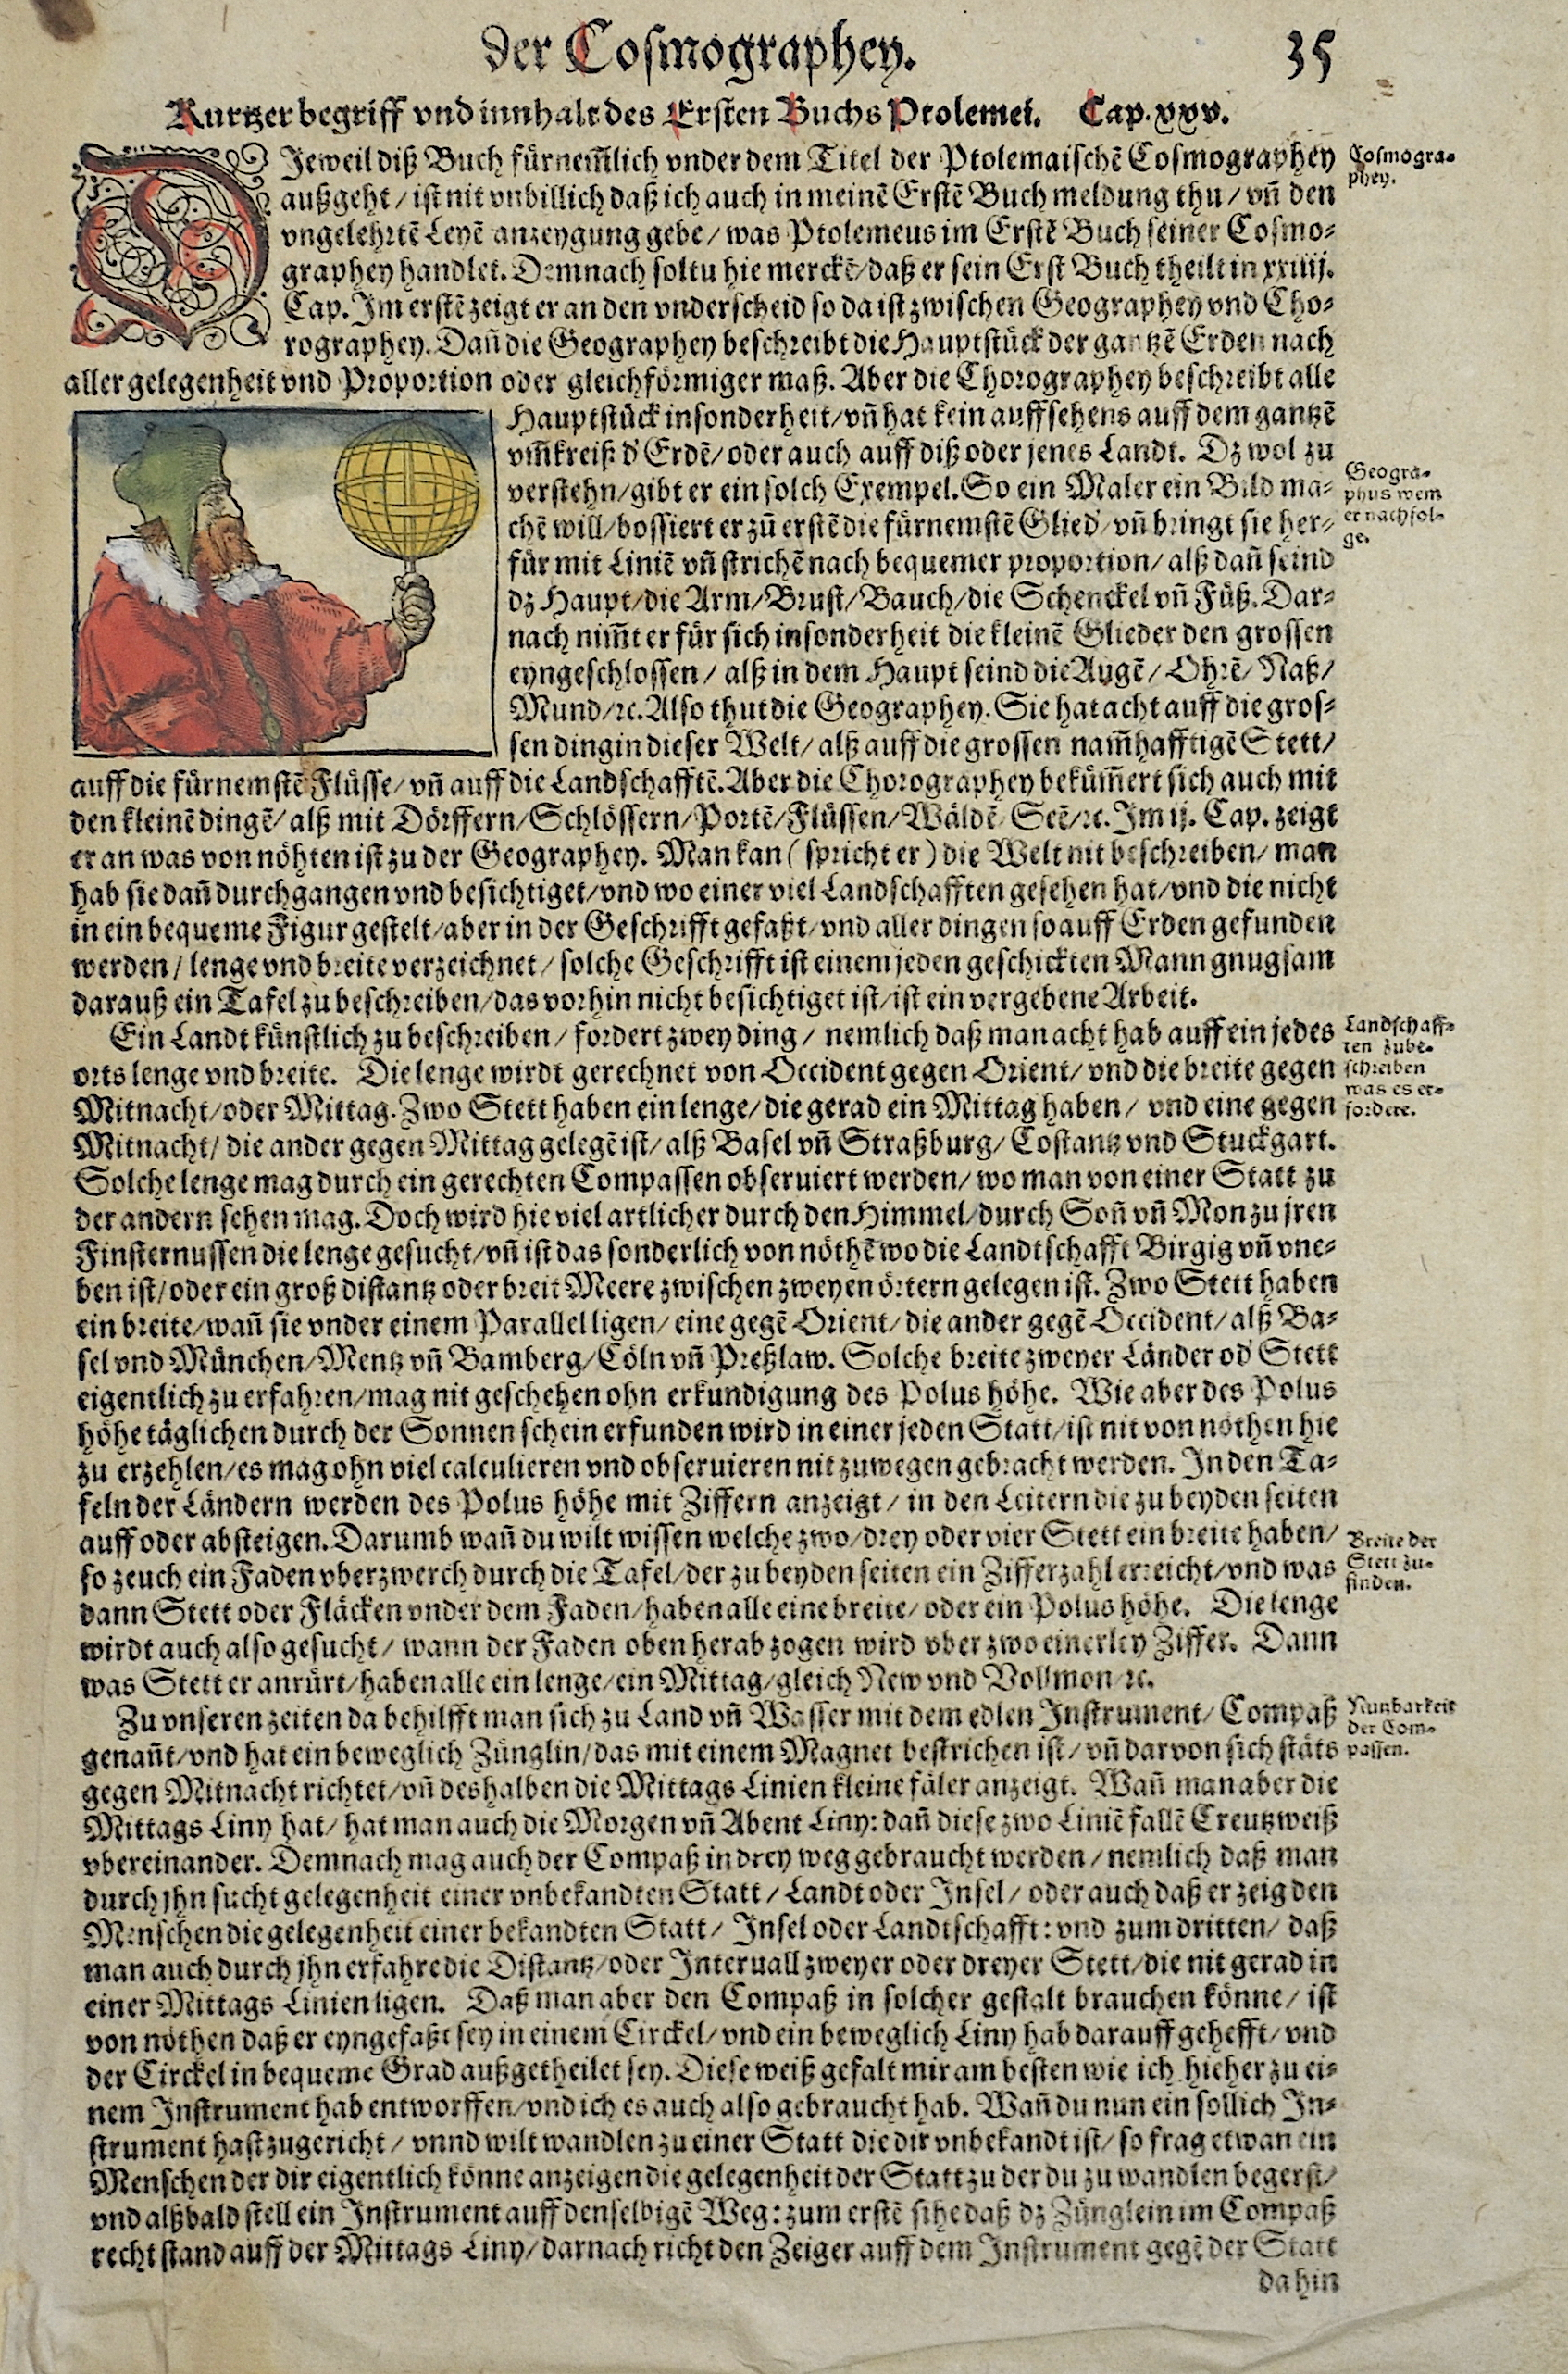 Münster Sebastian der Cosmographen.